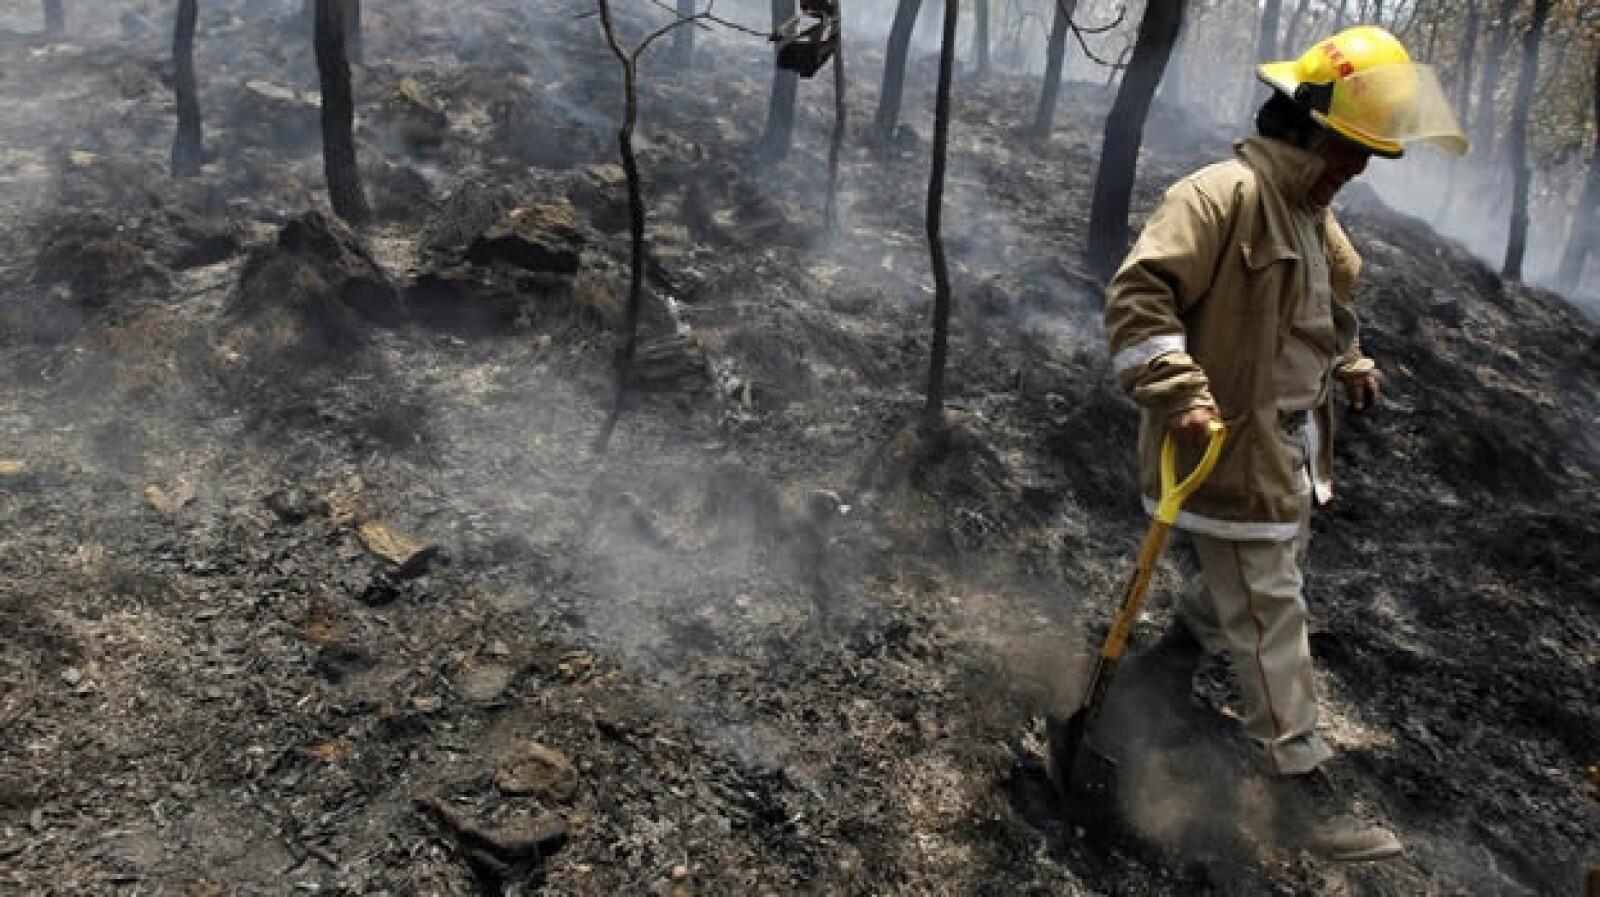 incendio bosque la primavera guadalajara jalisco